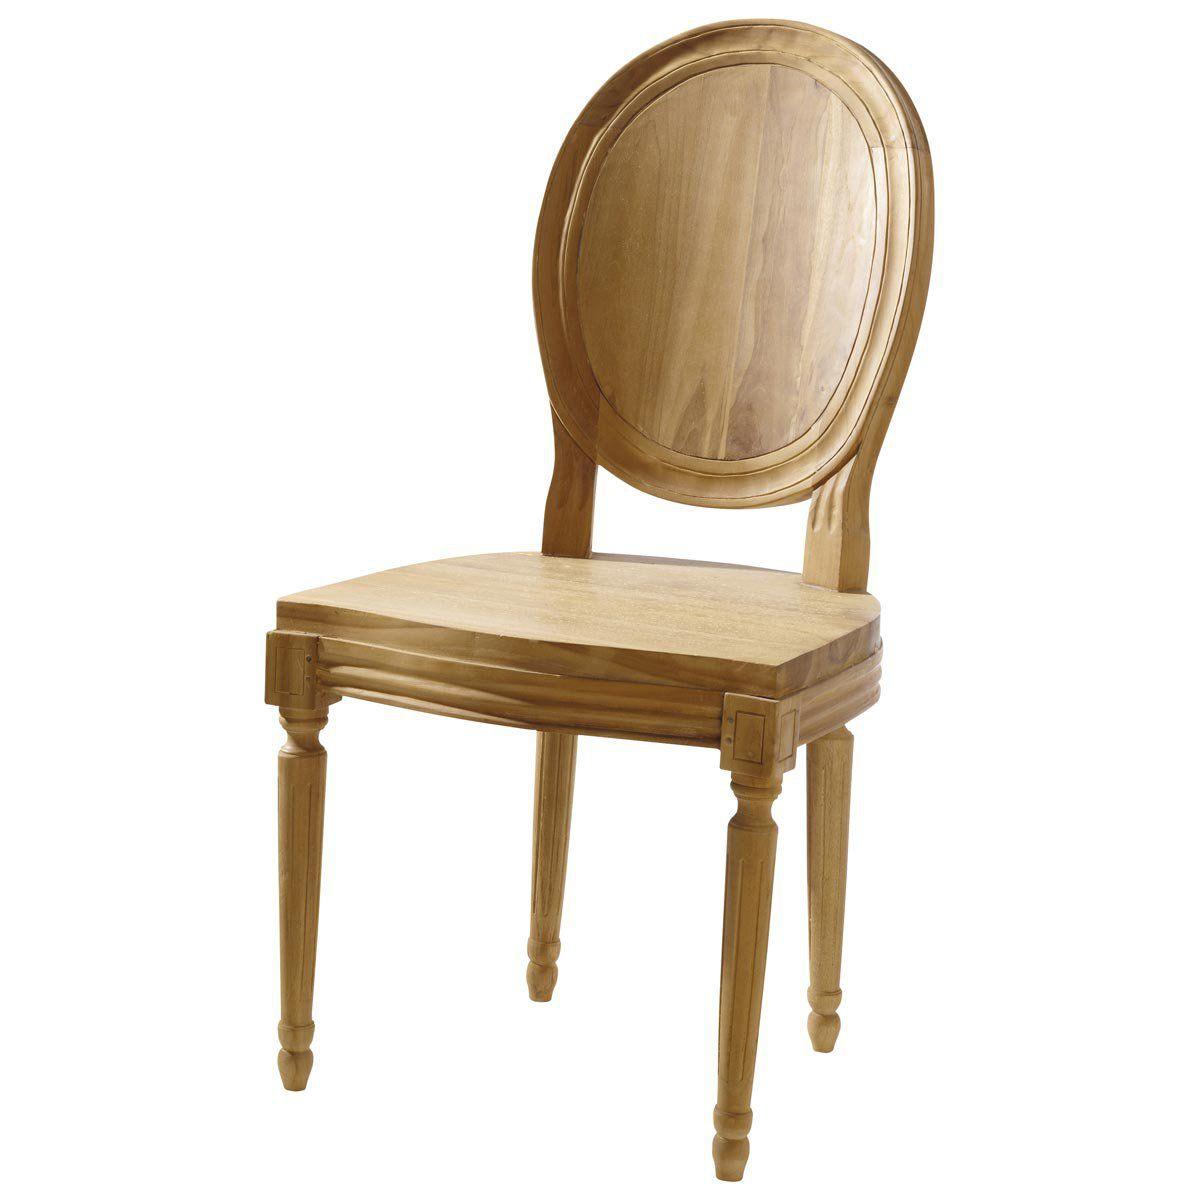 Acabados al aceite para muebles de madera for Aceite para muebles de madera